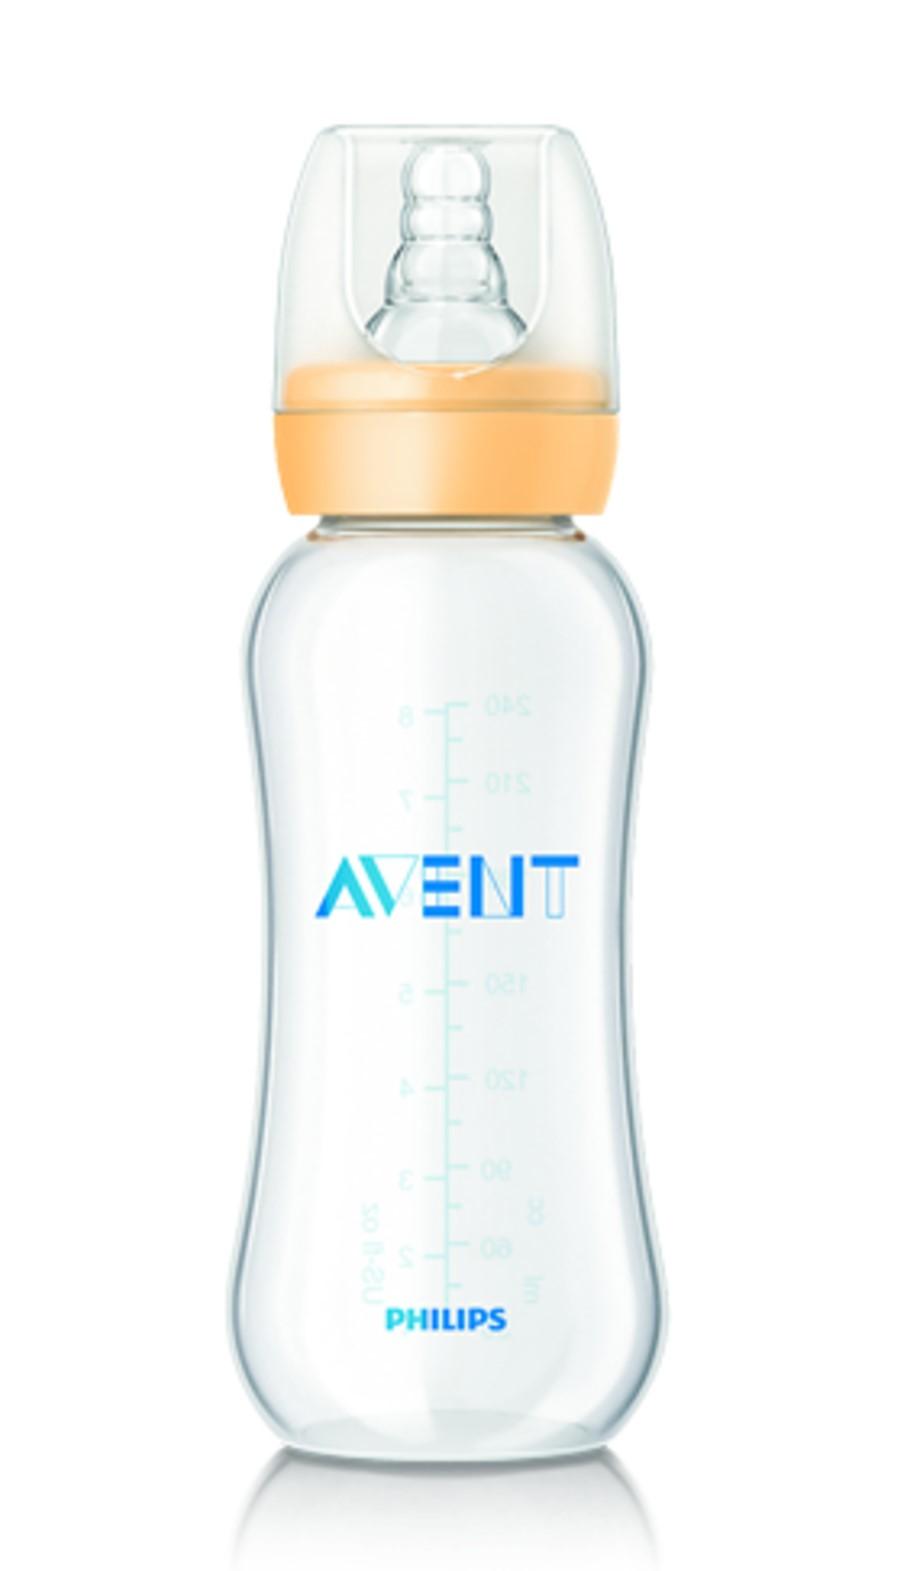 Бутылочки Philips AVENT SCF971/17 avent standard бутылочка для кормления 300 мл 1 шт